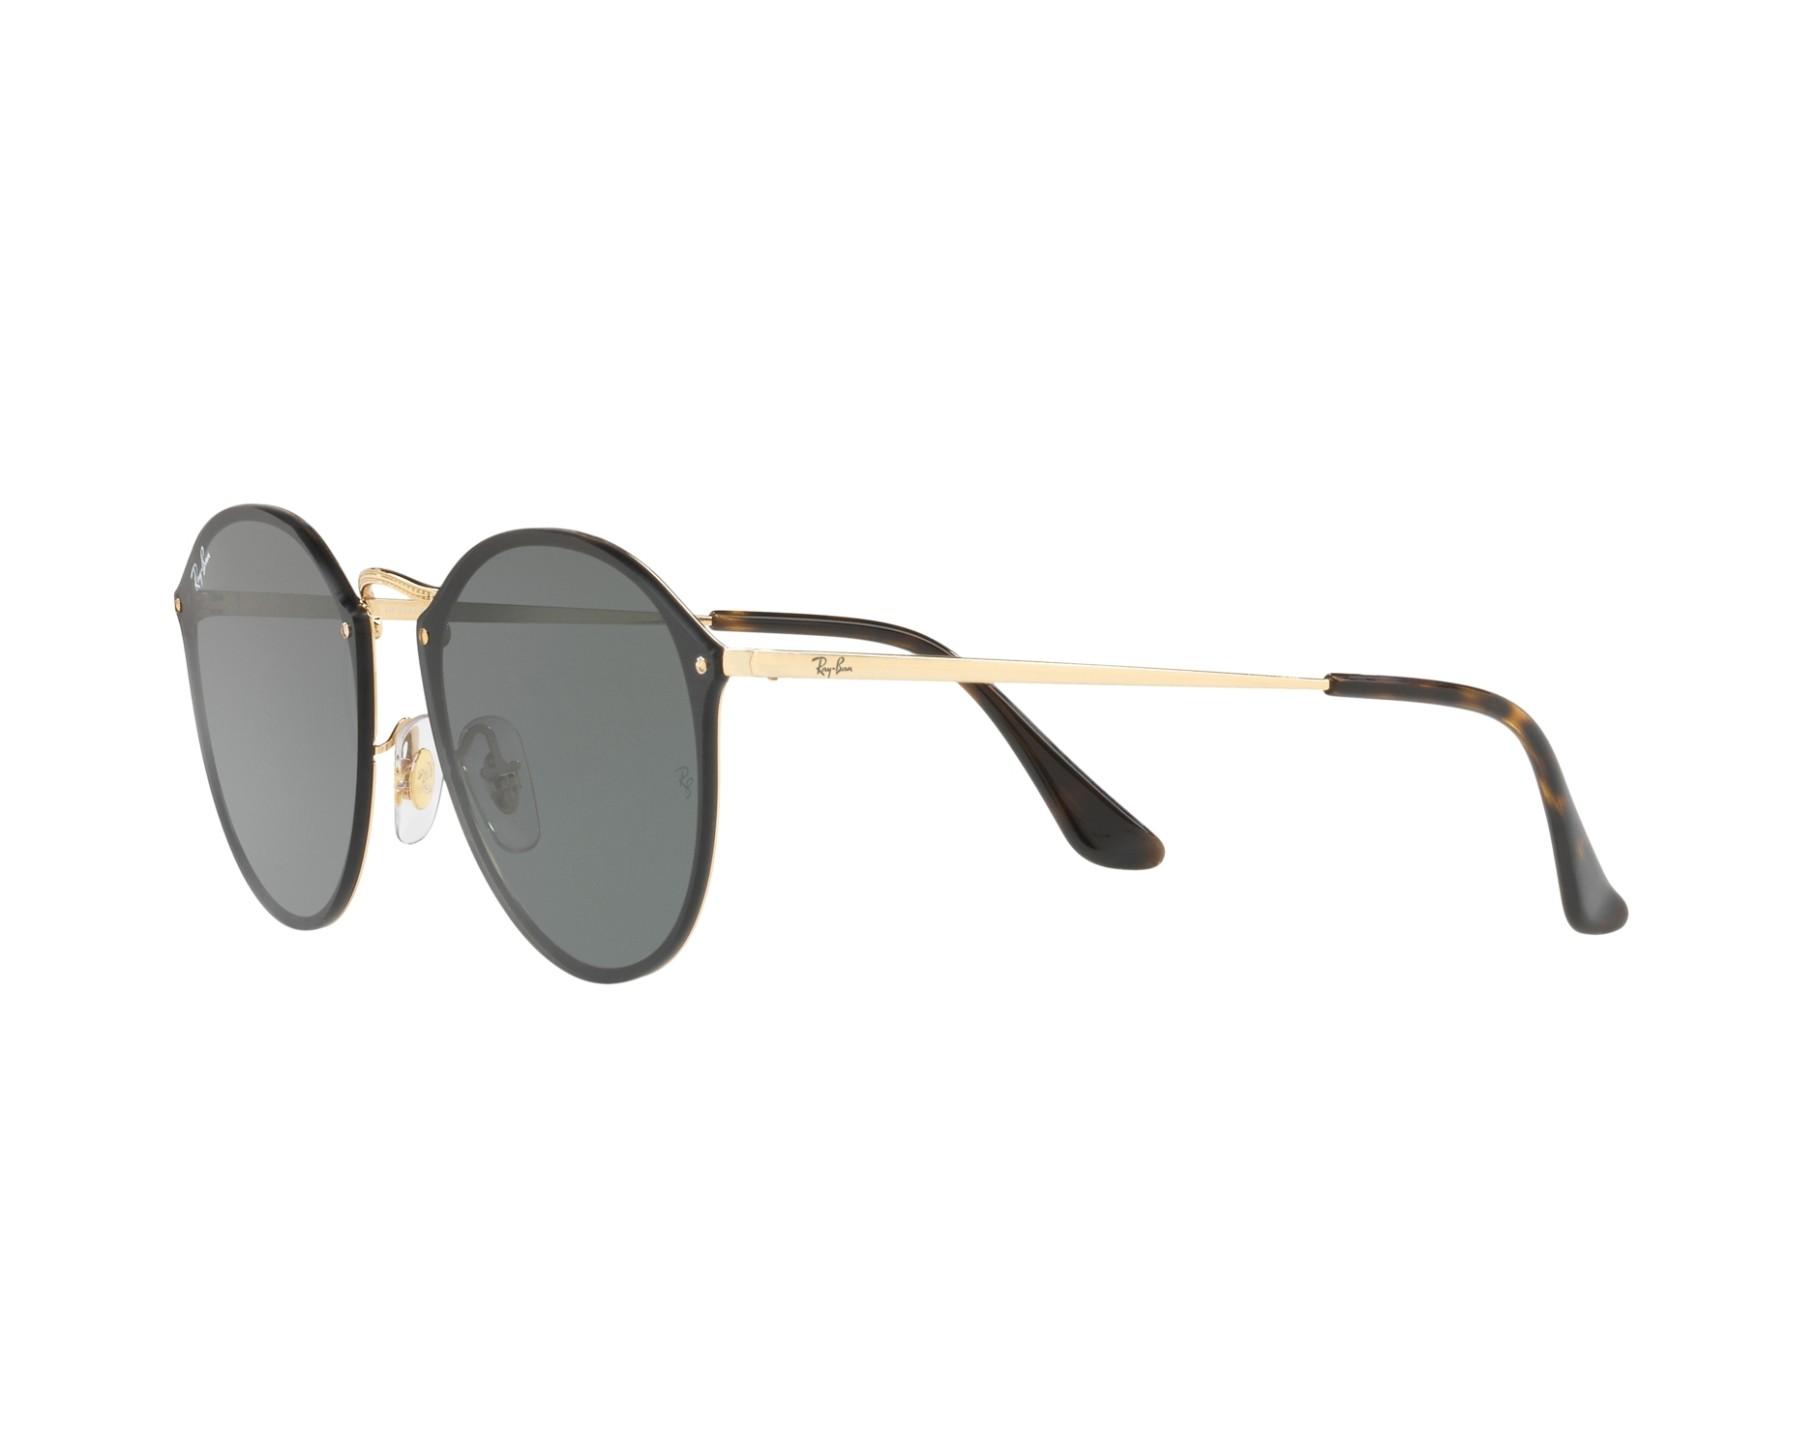 0ada5dd13e Sunglasses Ray-Ban RB-3574-N 001 71 59-14 Gold